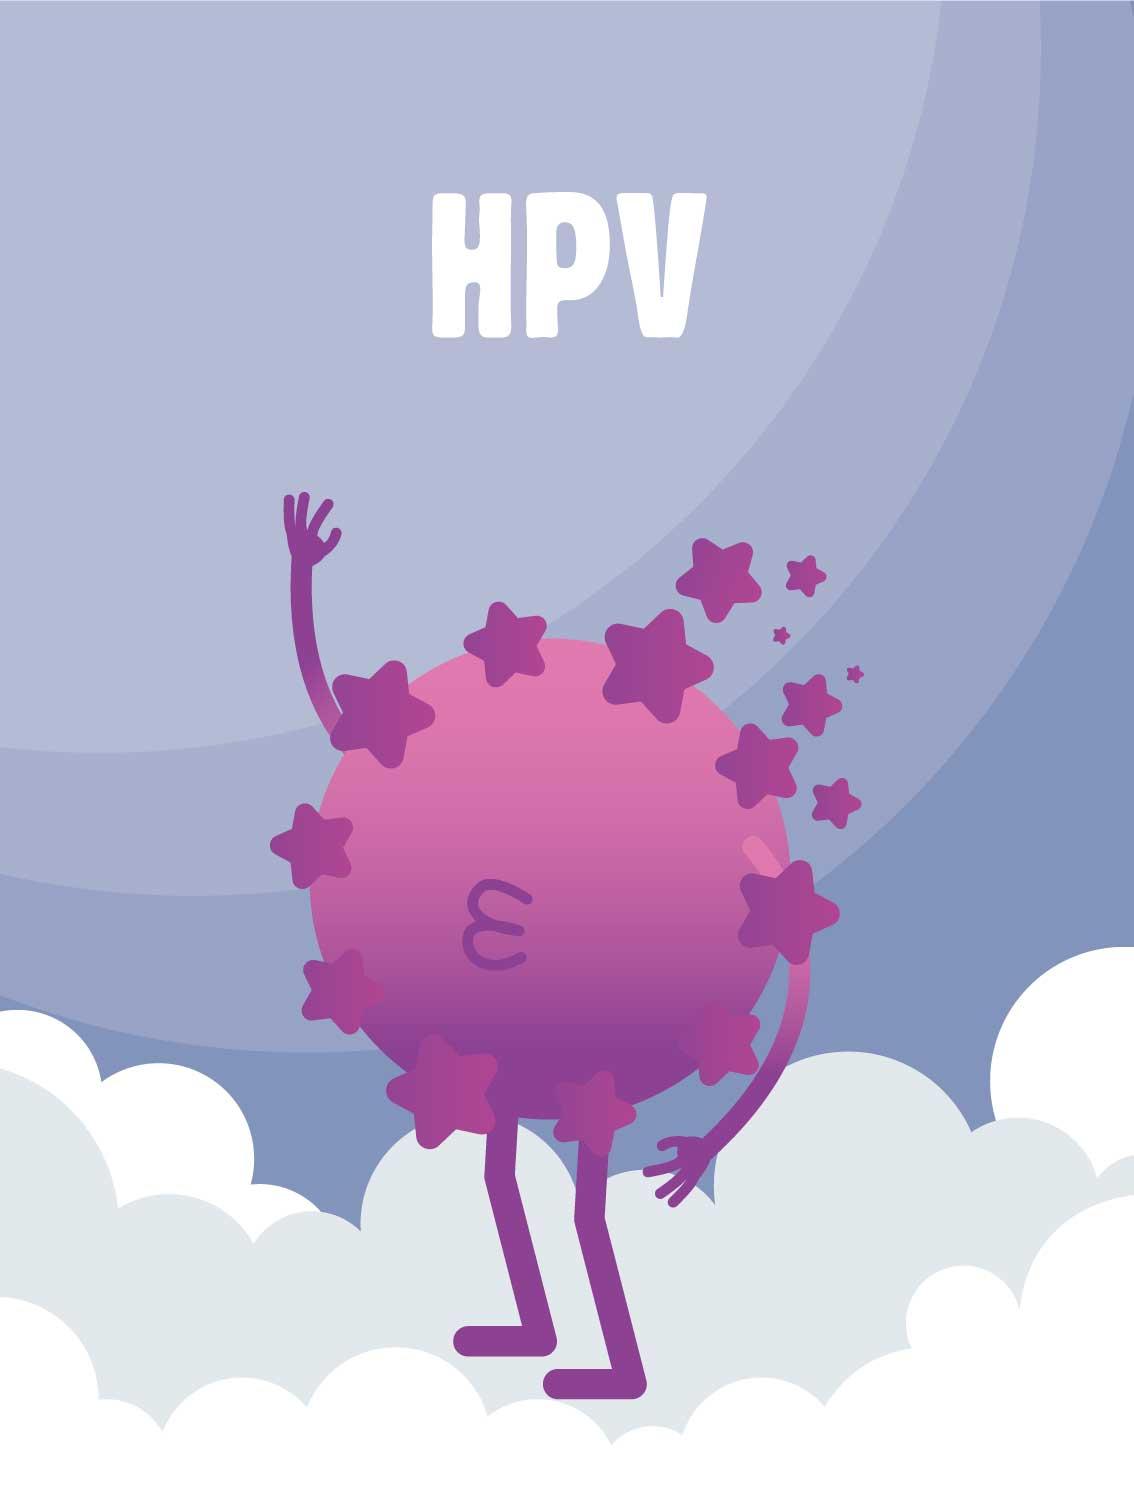 recherche de papillomavirus chez lhomme human papillomavirus transmission mode